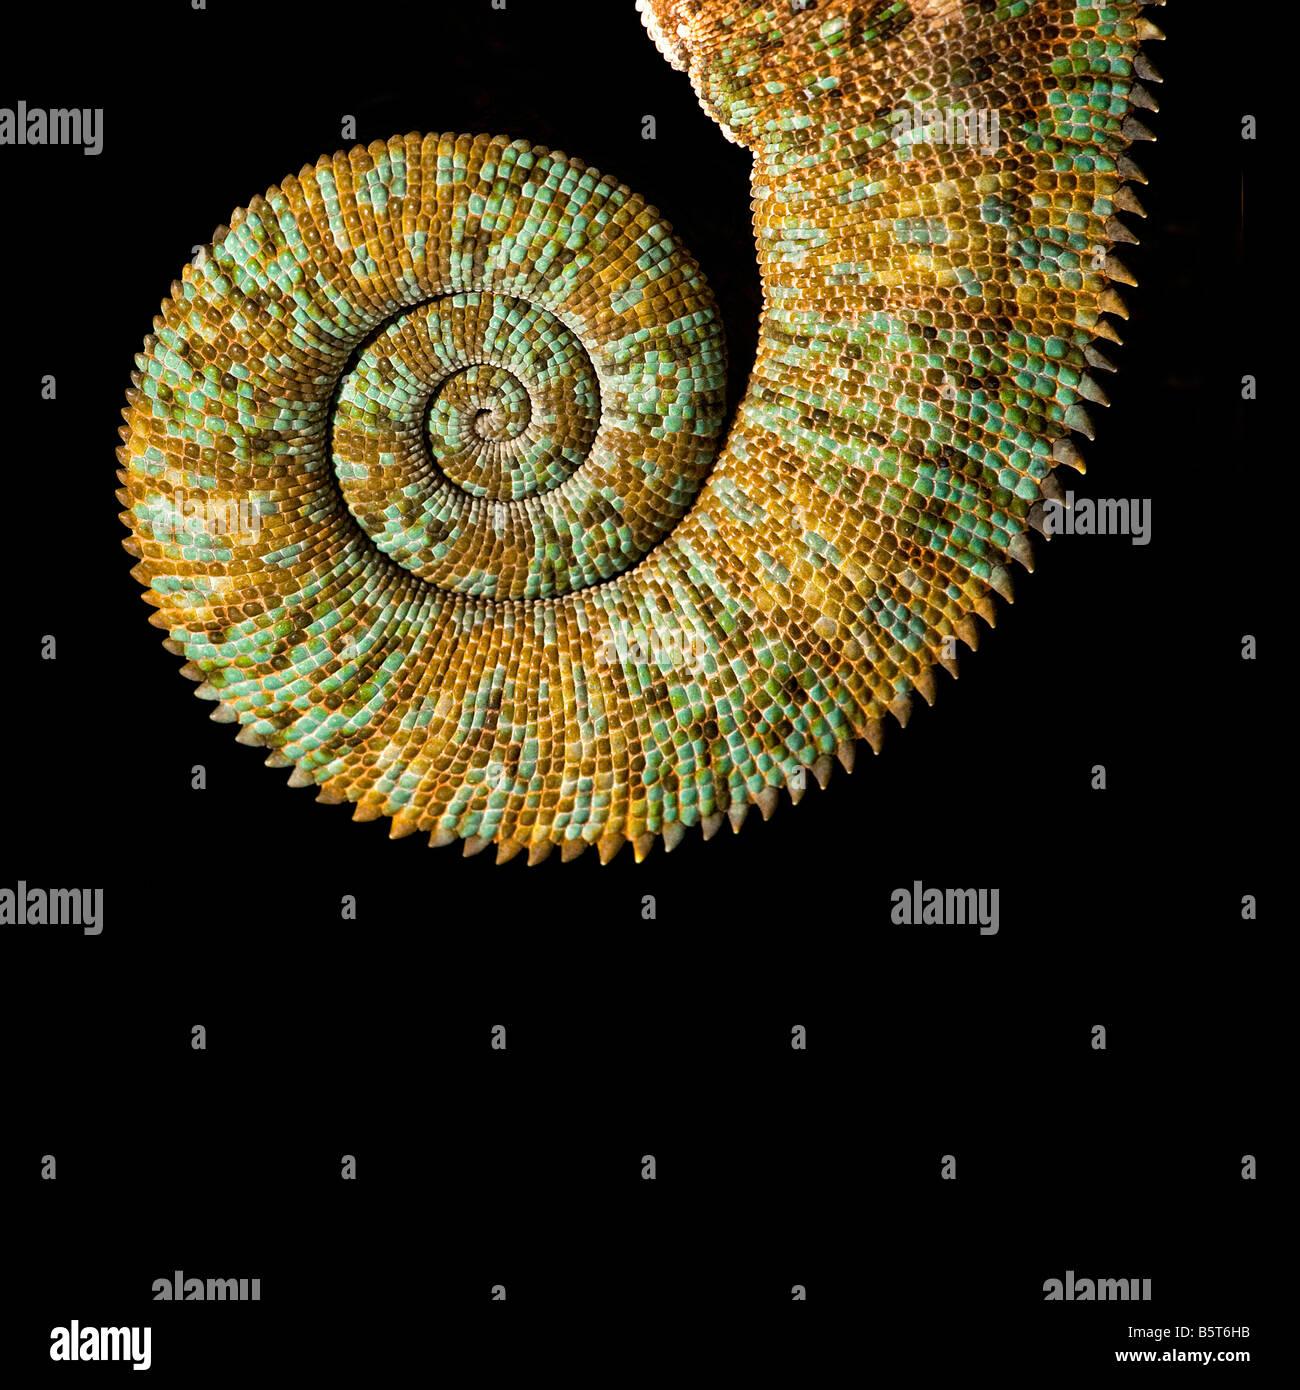 Macho o velado camaleón del Yemen Chamaeleo catytratus bobina de cola Imagen De Stock